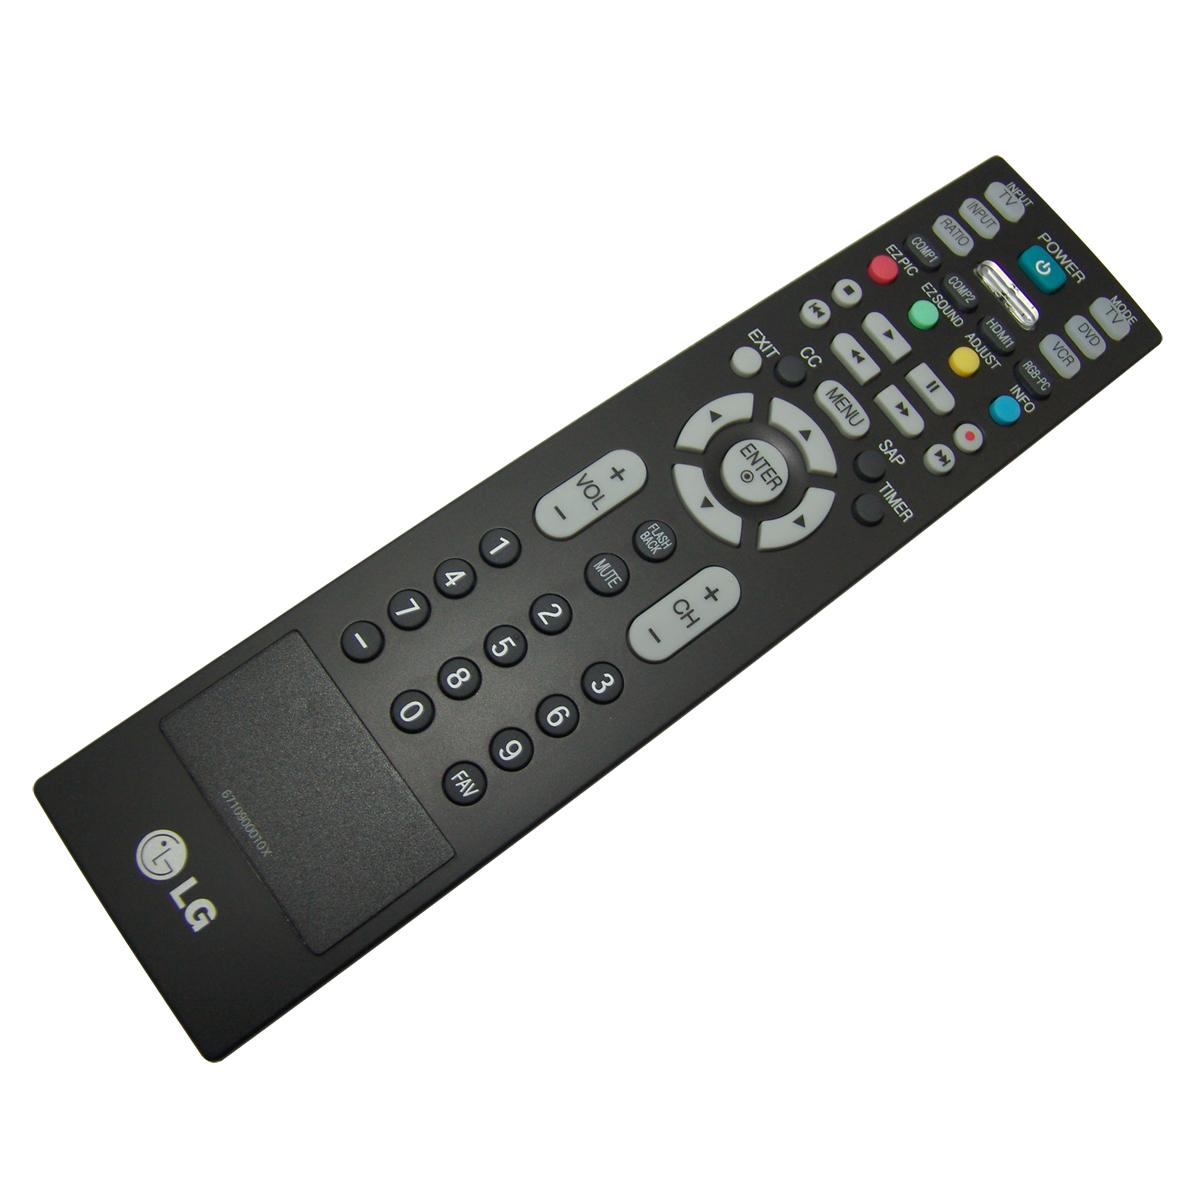 Original Lg Remote Control For 32lc2r Tv Television